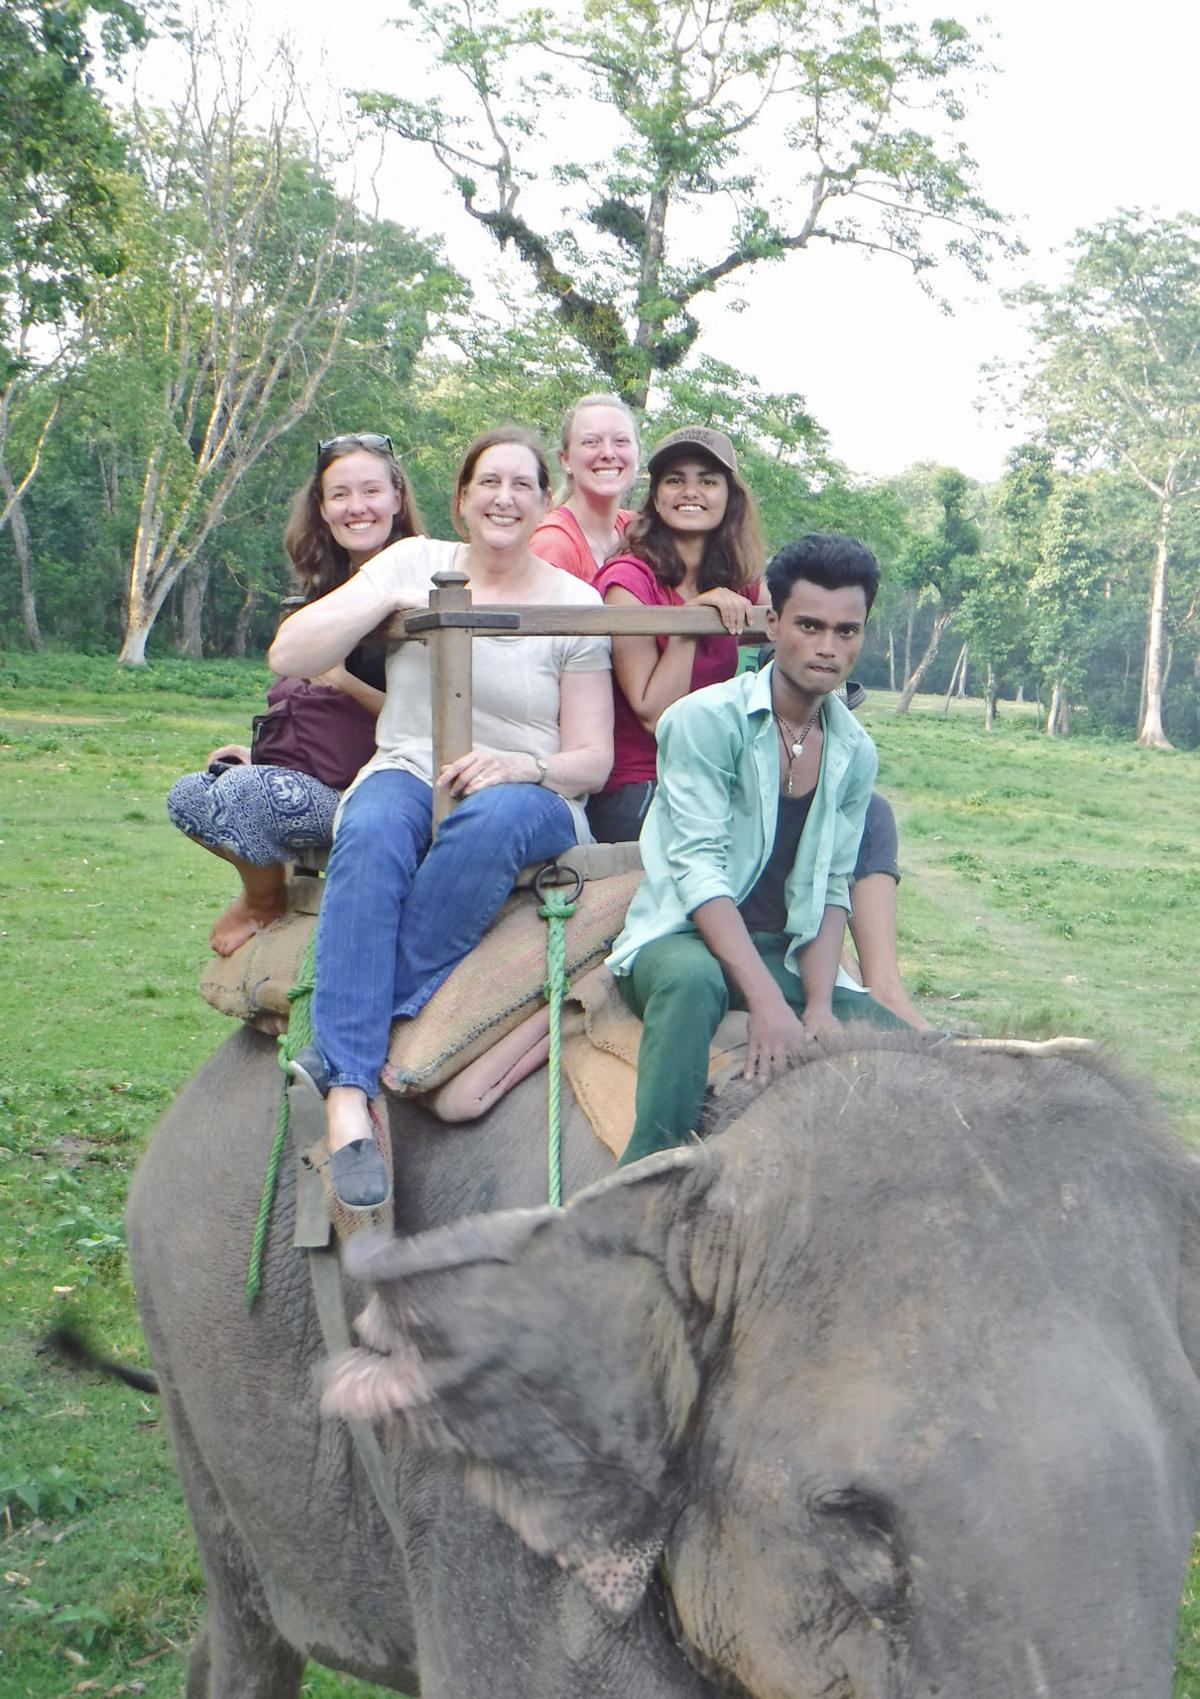 Mission Trip Leads Blalocks To Explore Nepal, Thailand, China